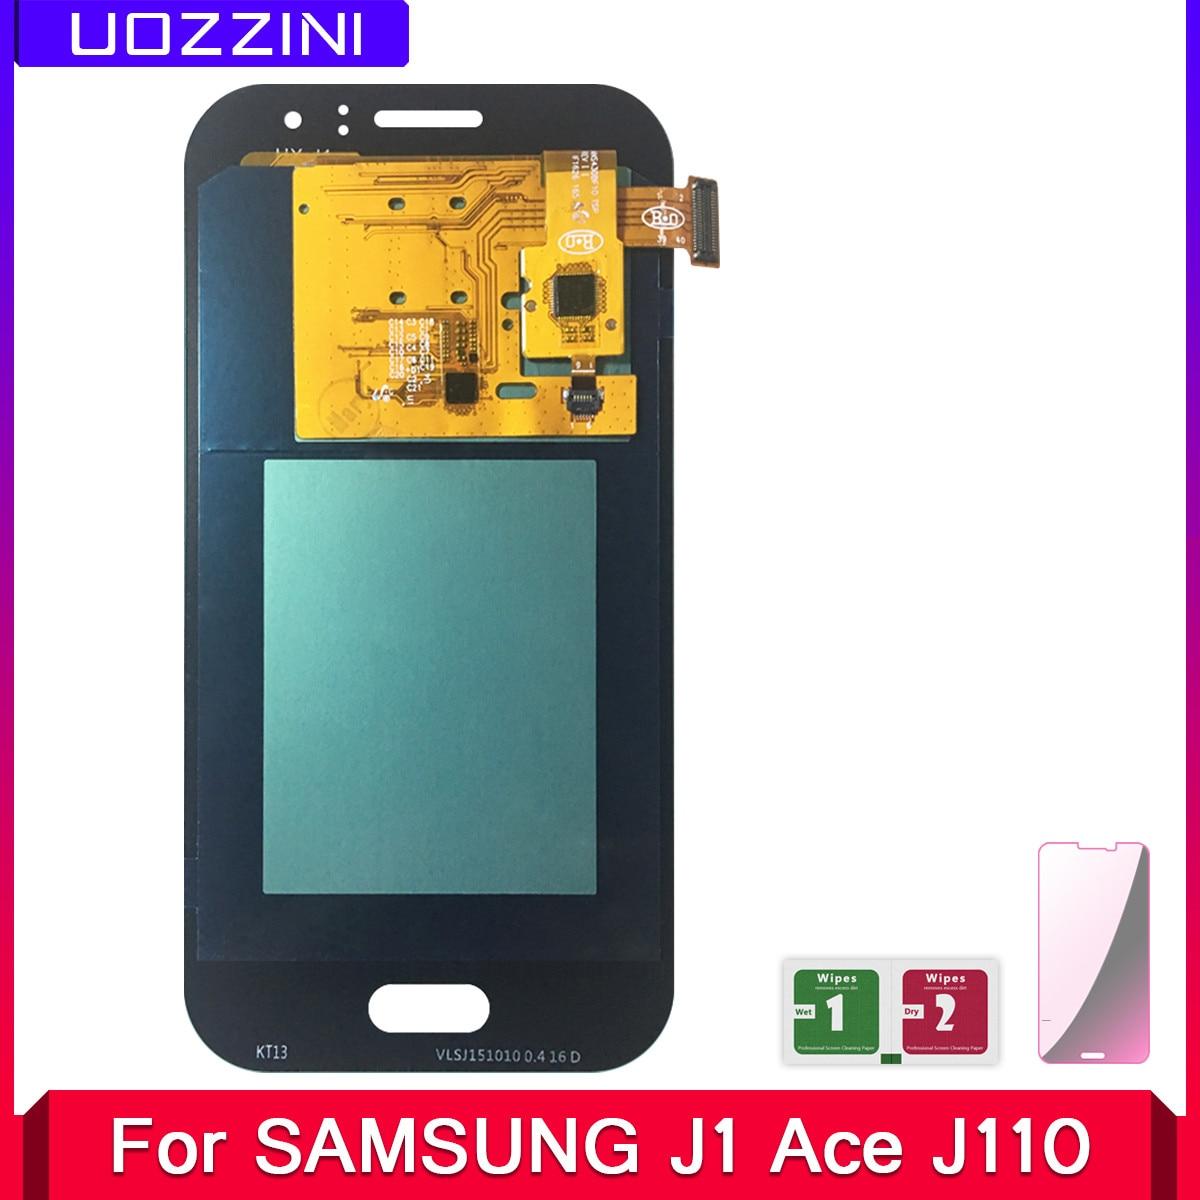 2 uds AMOLED para Samsung Galaxy J1 Ace J110 SM-J110F J110H J110FM pantalla LCD 100% probado montaje de pantalla táctil de trabajo